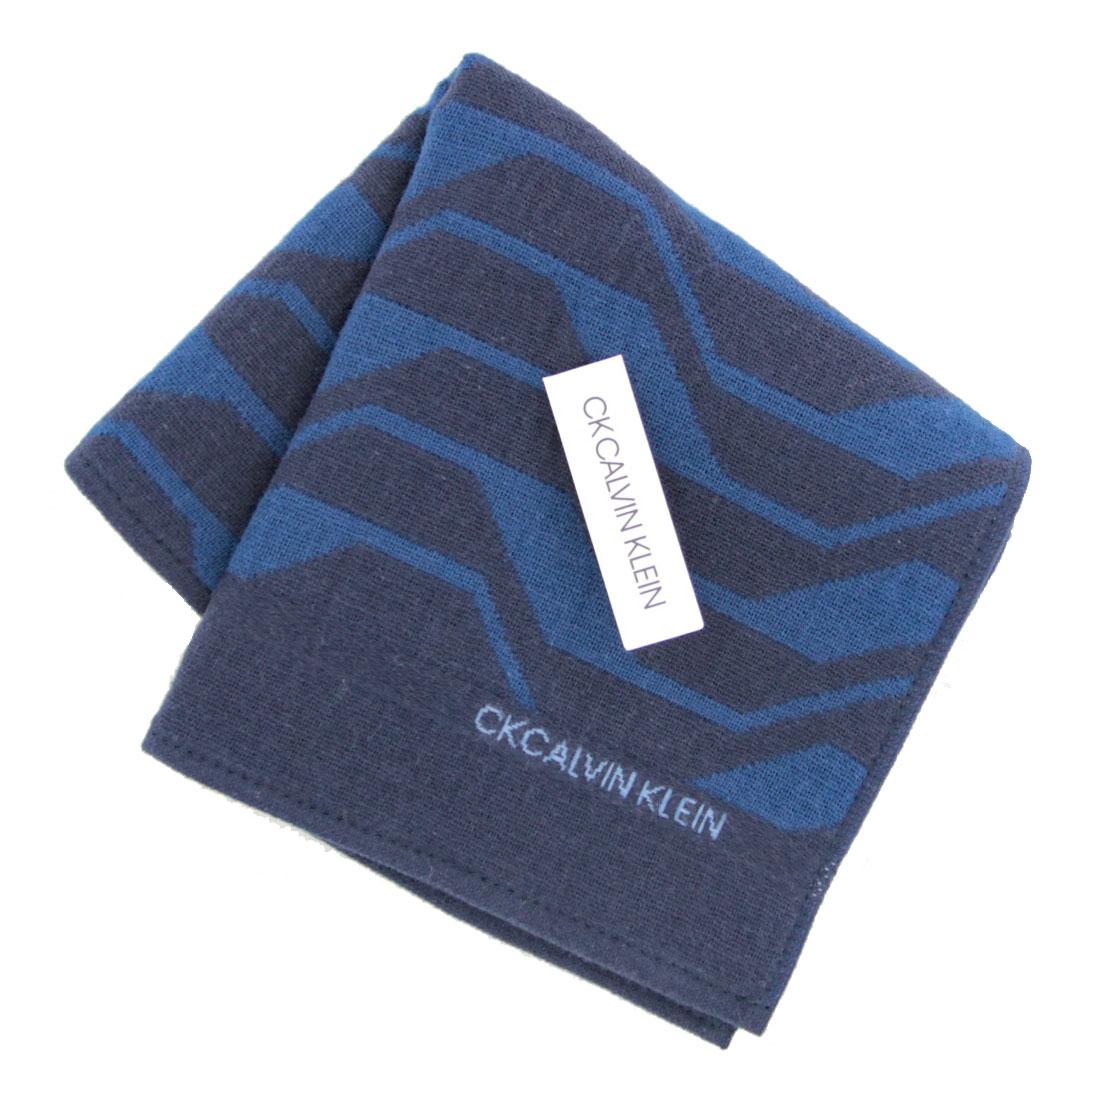 Calvin Klein カルバン クライン 0253 送料無料 新品 全品最安値に挑戦 ネイビー メンズタオルハンカチ